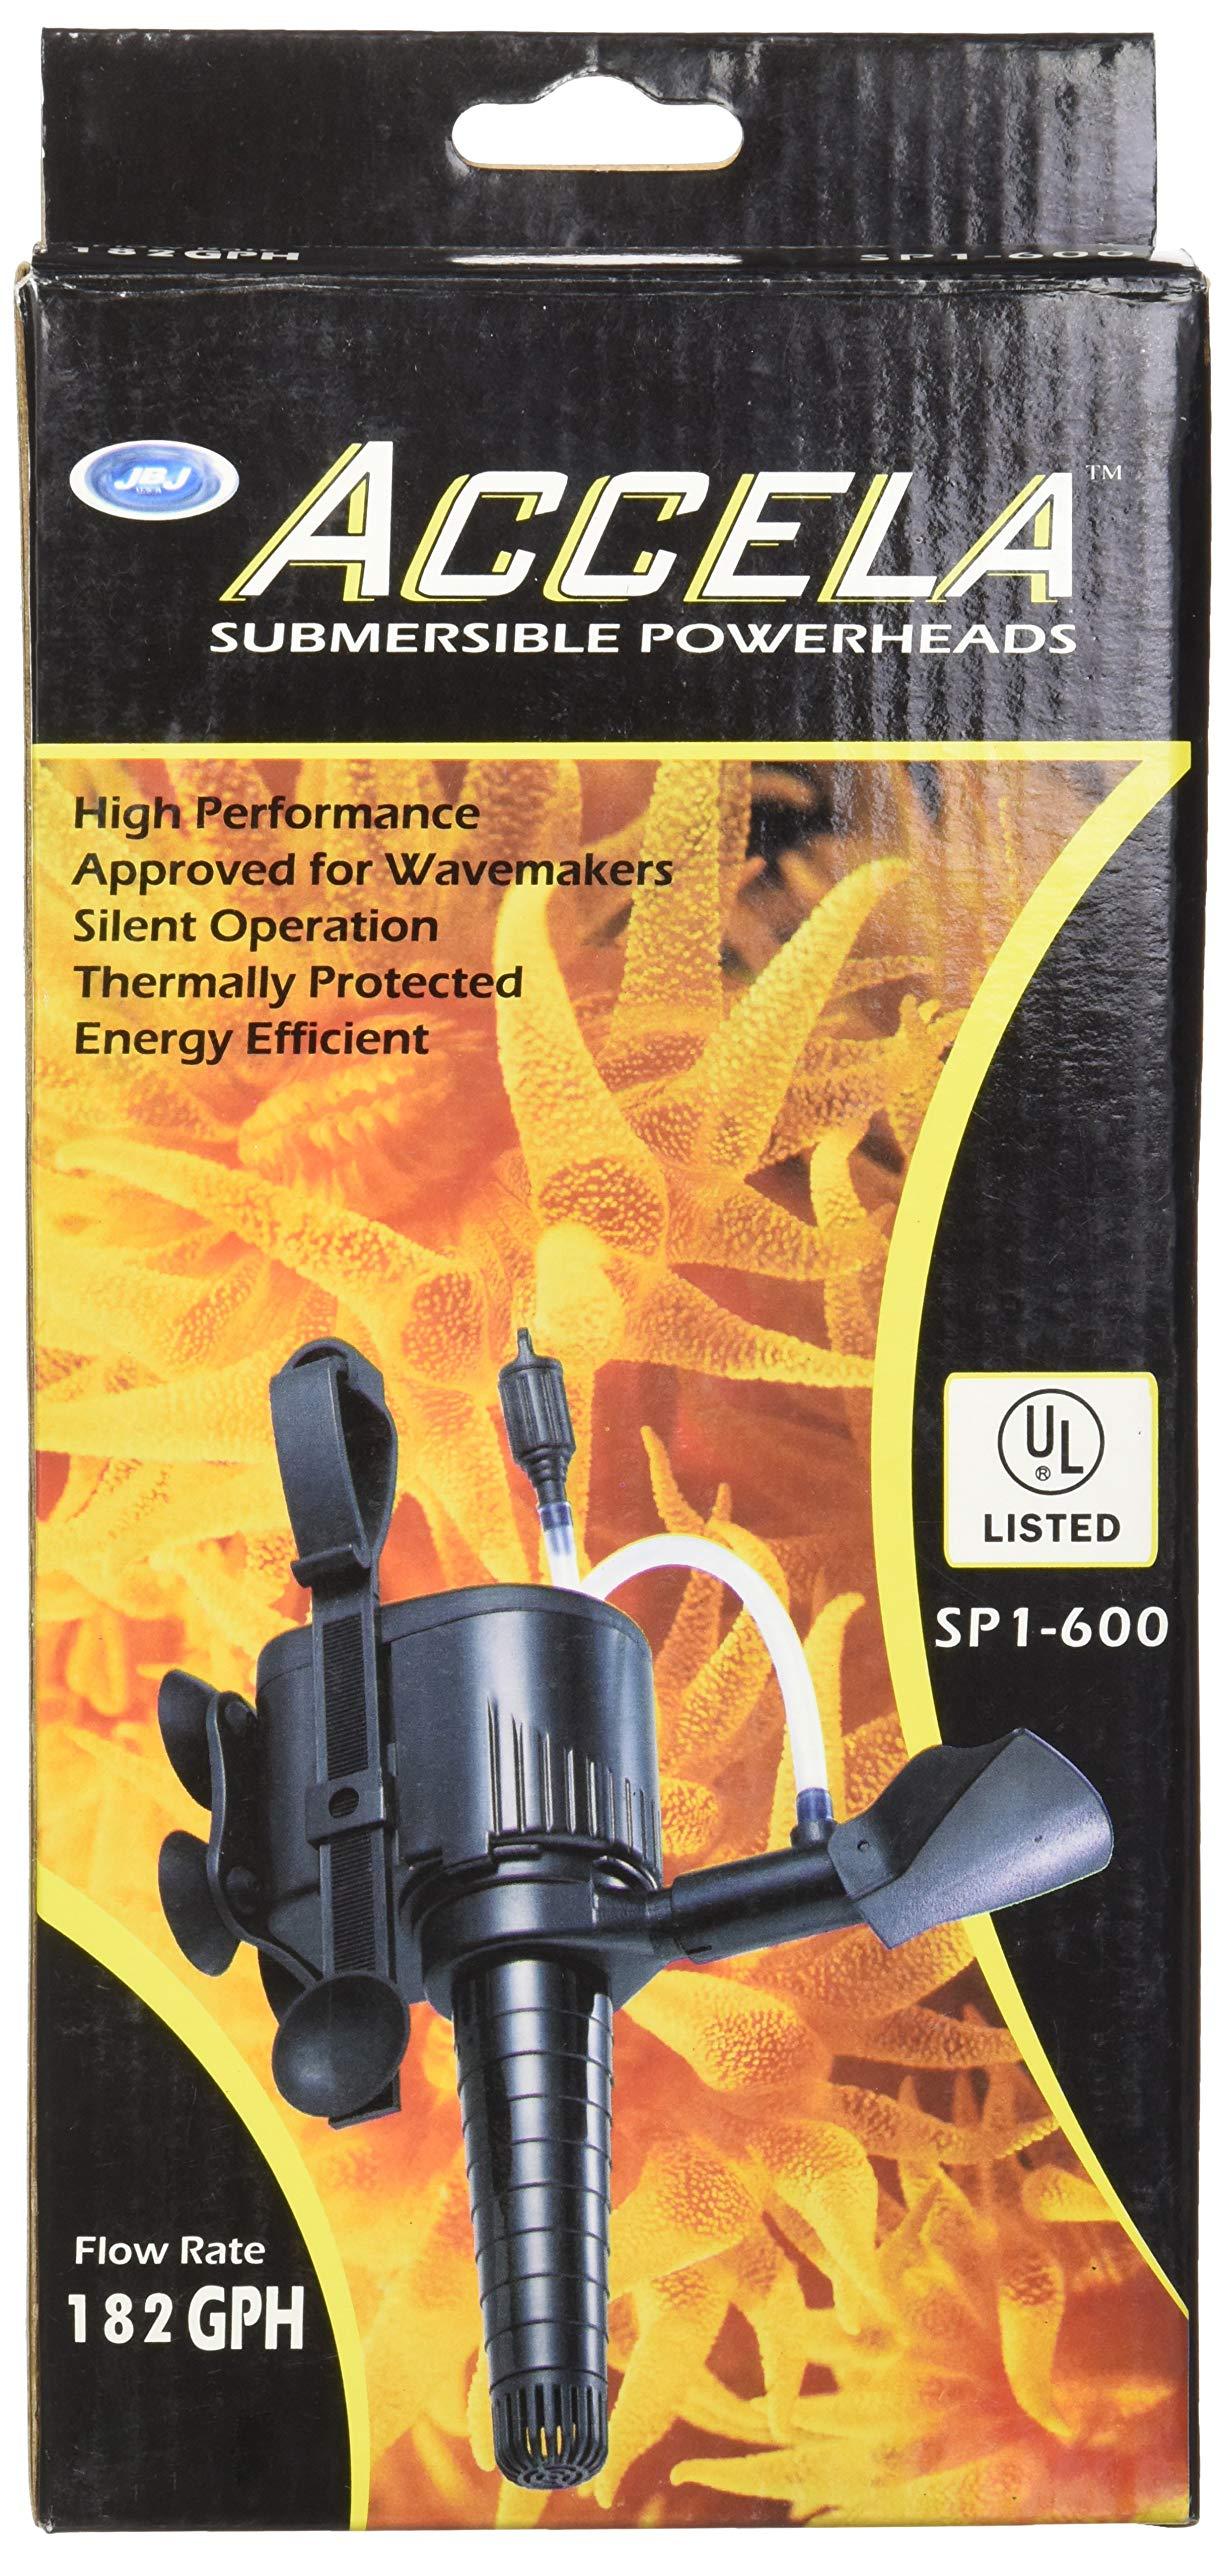 JBJ Lighting JB7344 Accela Submersible Powerhead, 182-GPH by JBJ Lighting (Image #3)